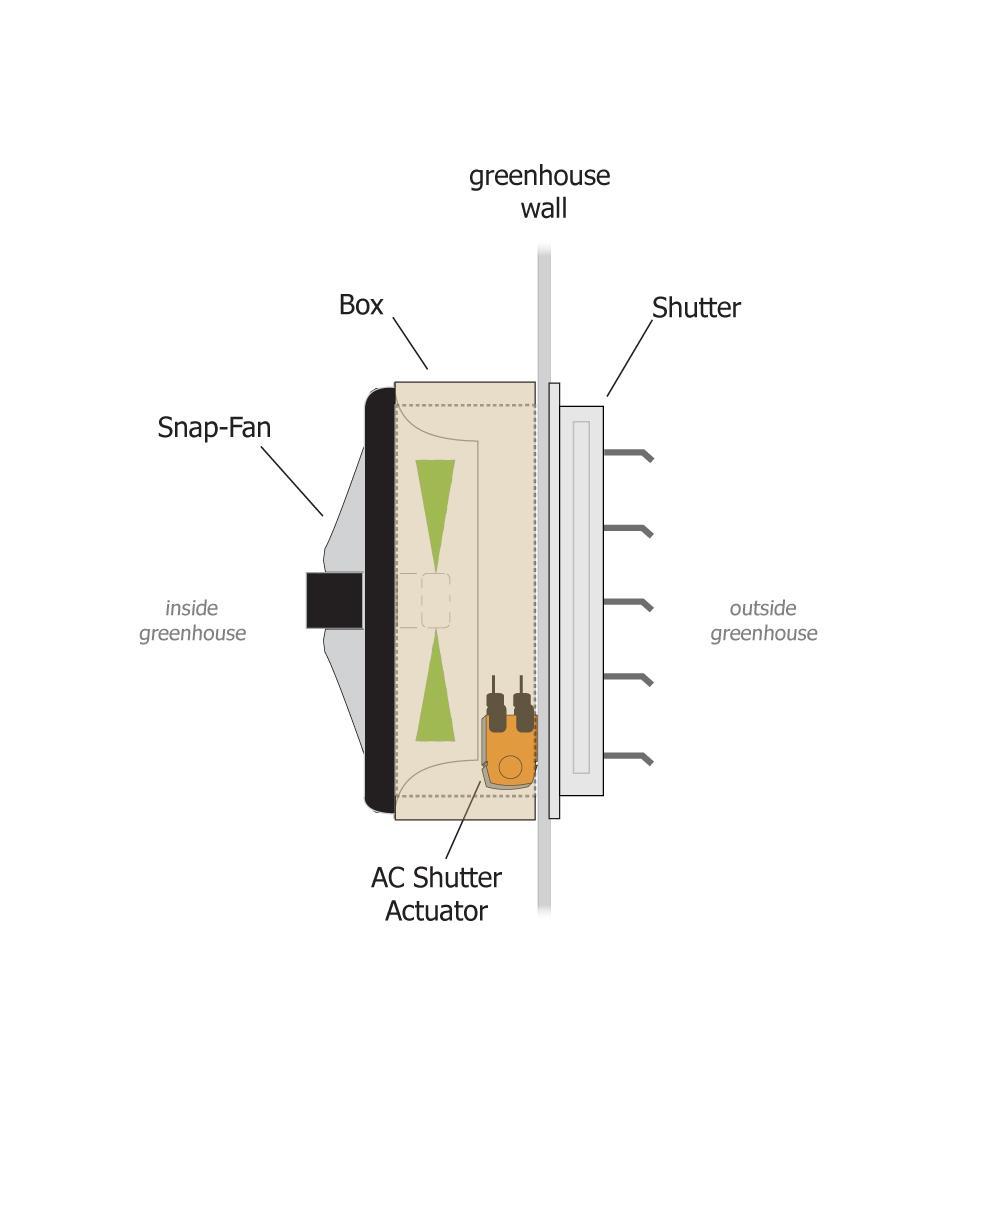 115 VAC Shutter Actuator Kit   Snap   Fan    Solar National Air Propulsion